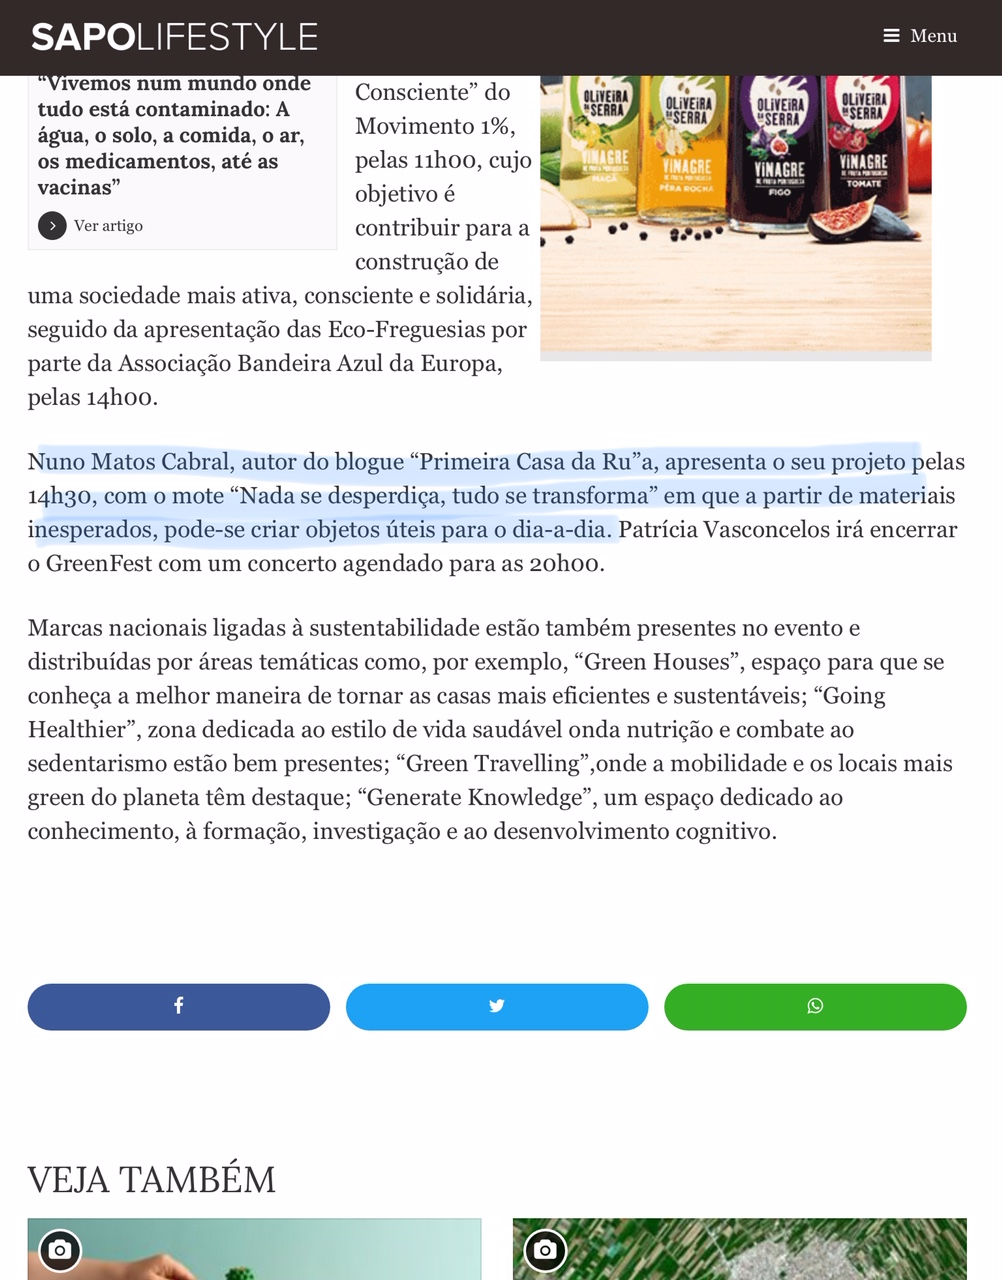 Nuno Matos Cabral _ Greenfest | Sapo